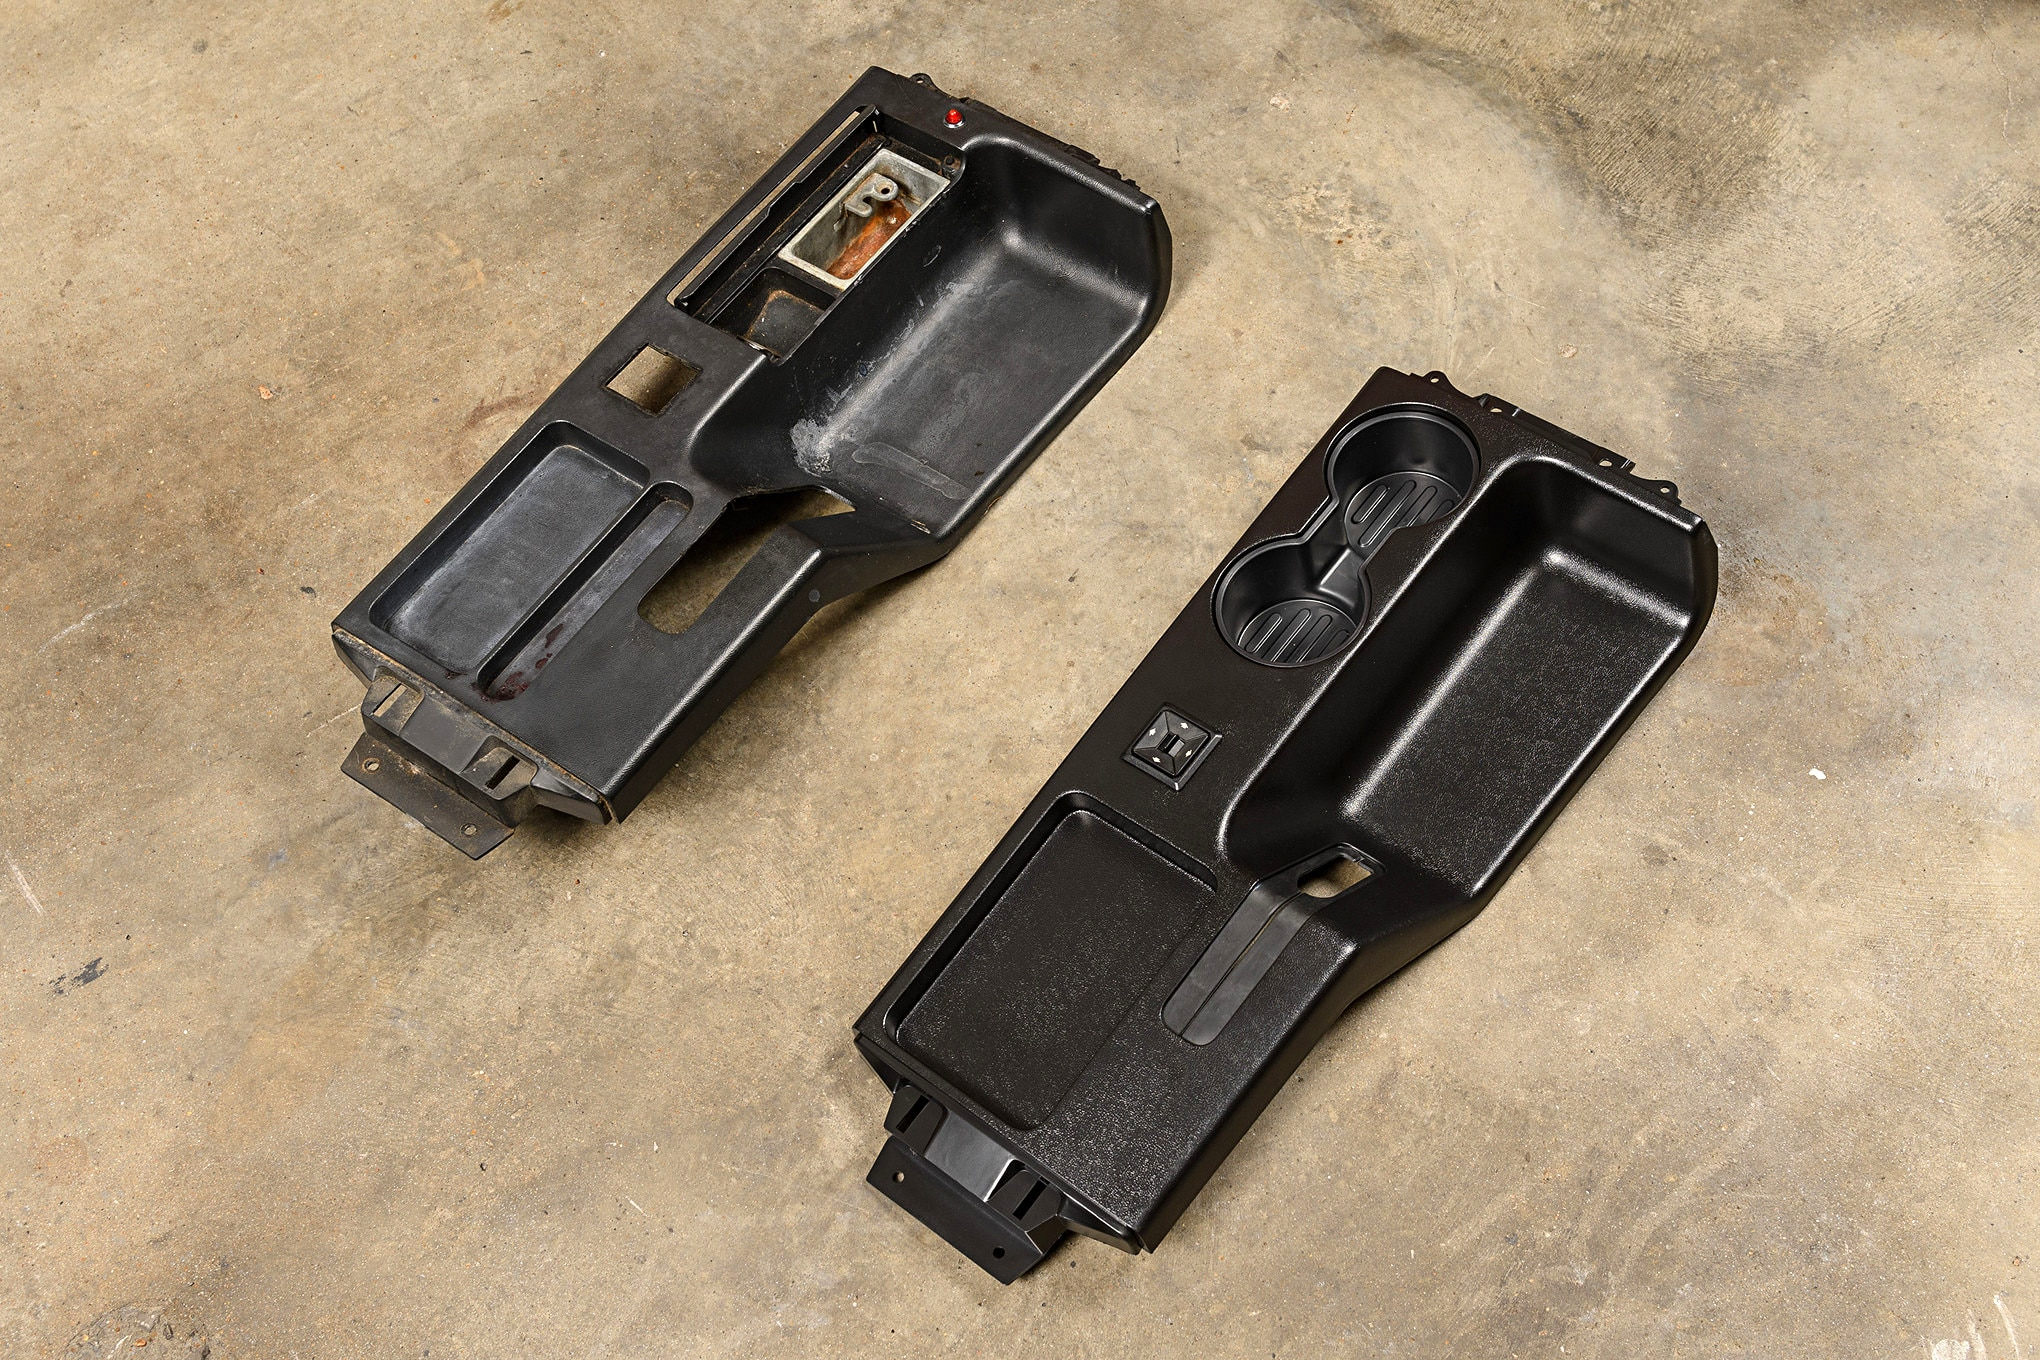 017 Mustang Center Console Lmr Comparison